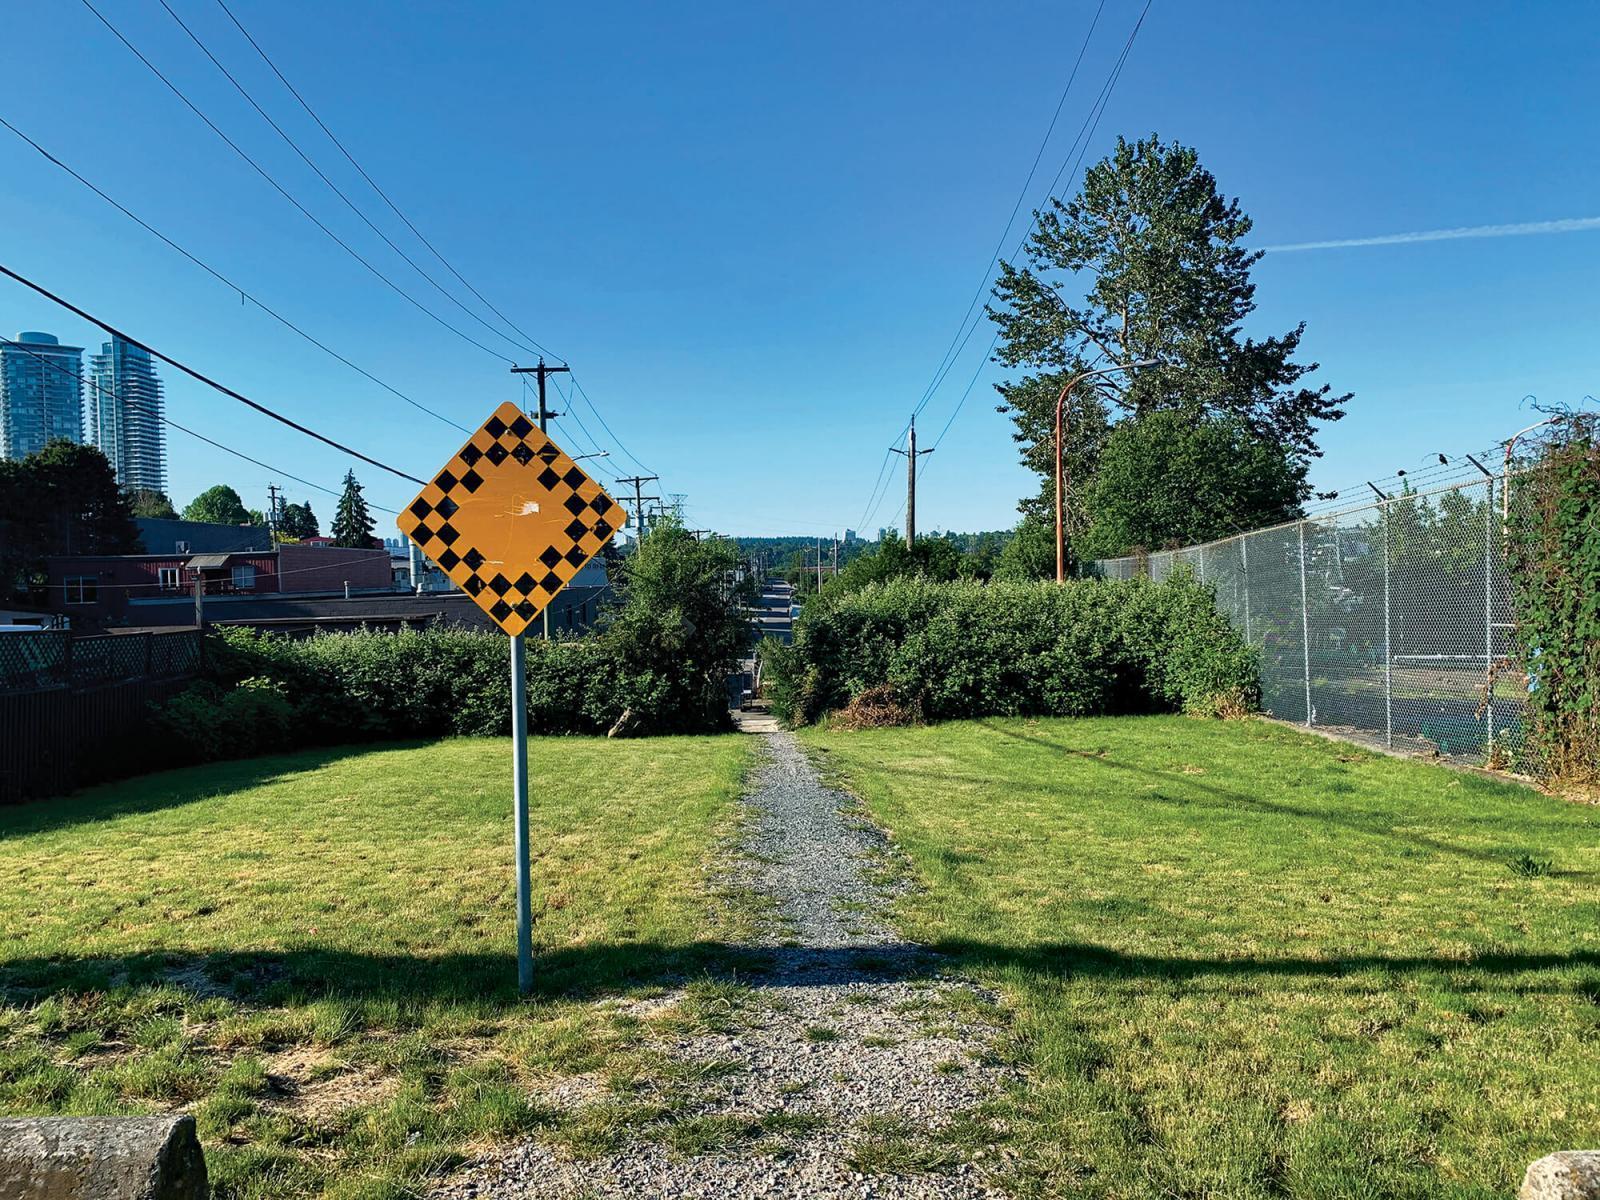 Burnaby green space renovation breaks ground